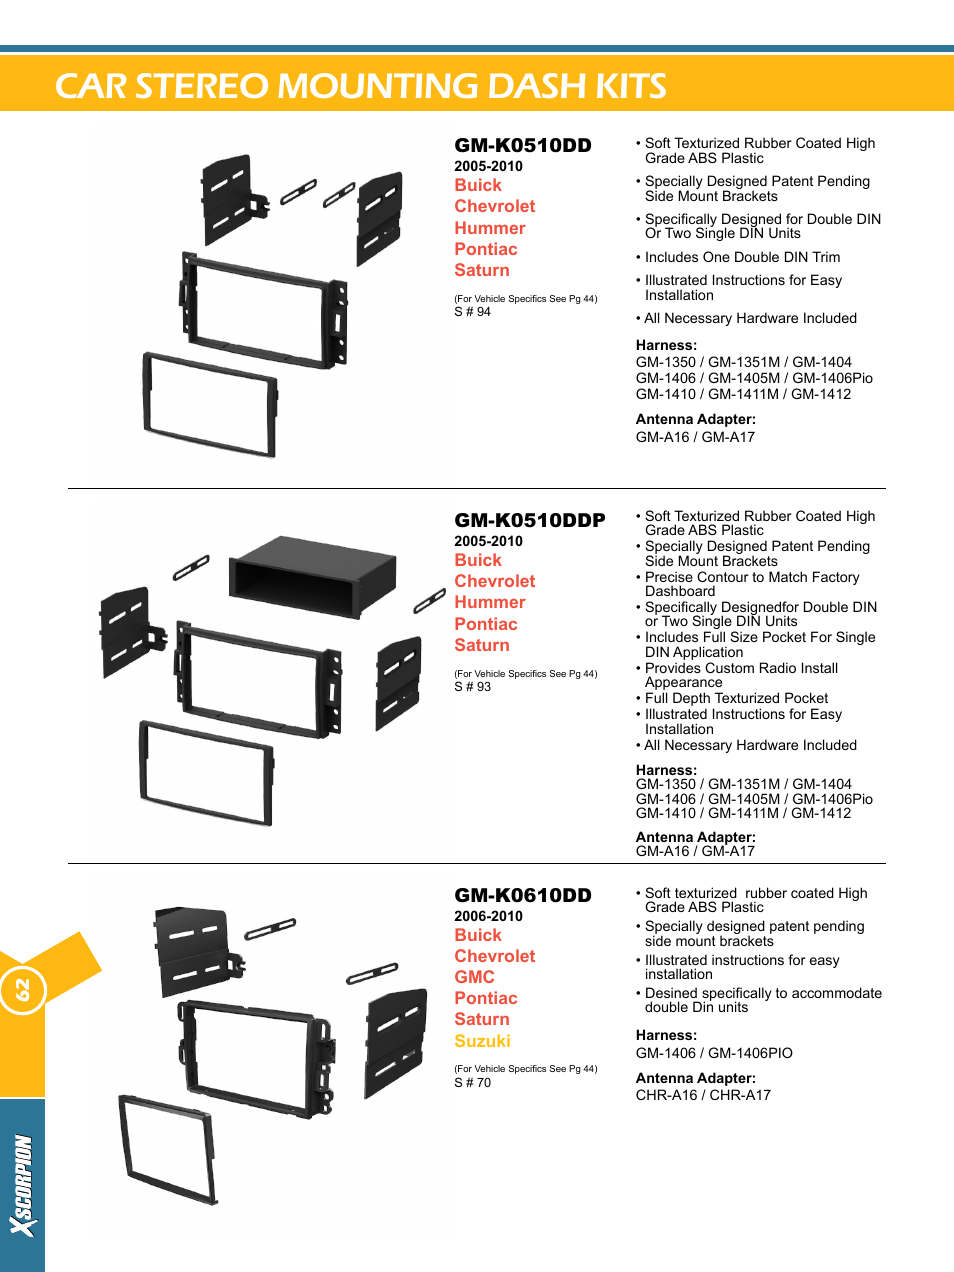 Car Stereo Mounting Dash Kits Gm K0510dd K0510ddp Xscorpion Buick Abs Diagram Kit Harness And Antenna Catalog User Manual Page 62 116